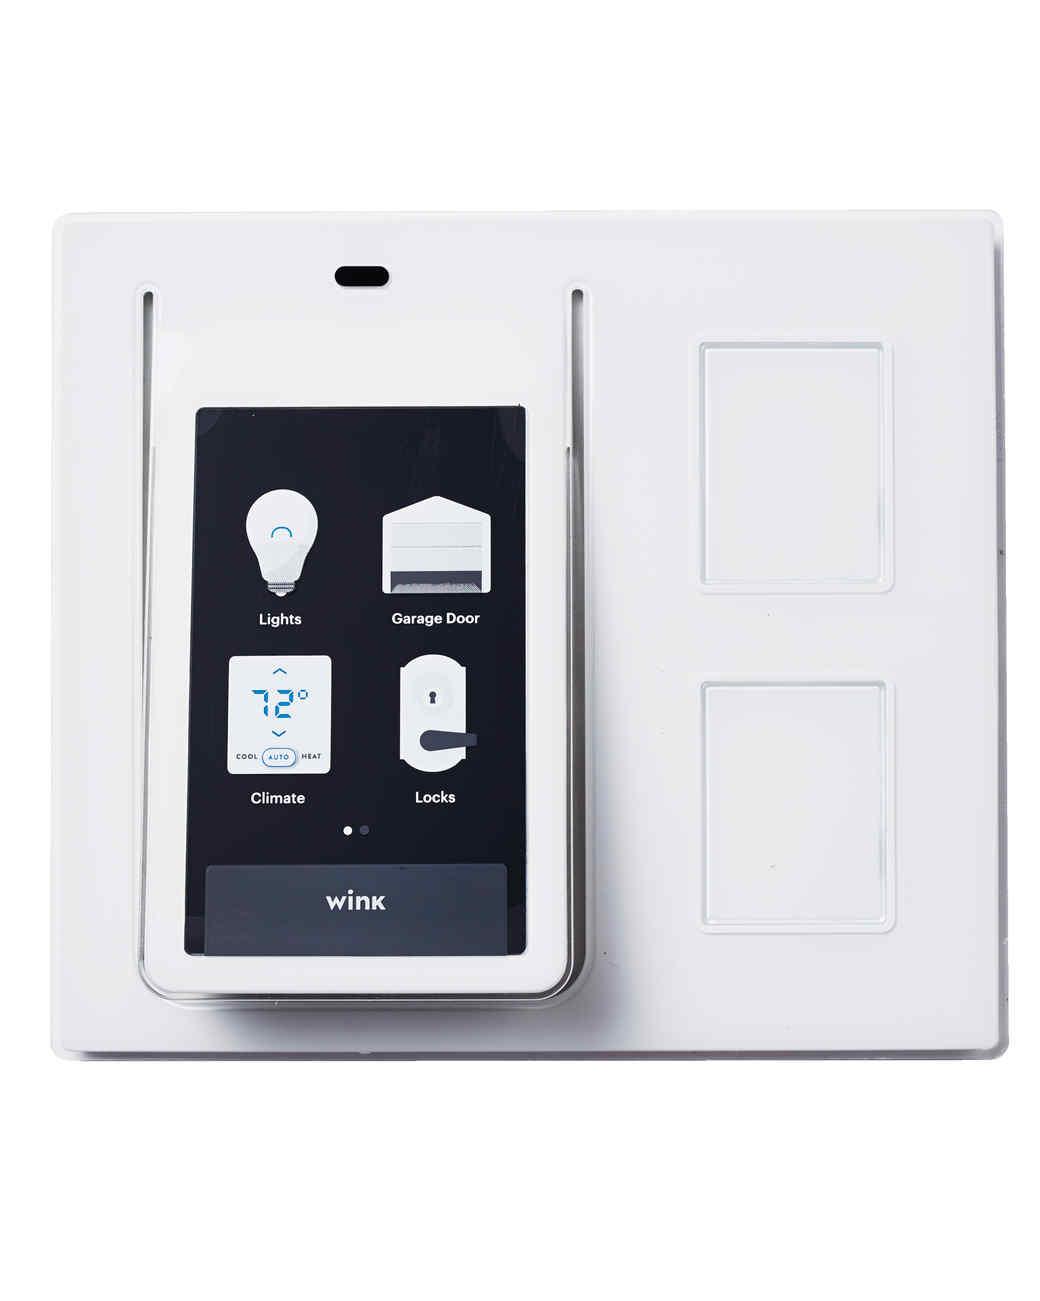 wink-hub-box-055-d111919.jpg